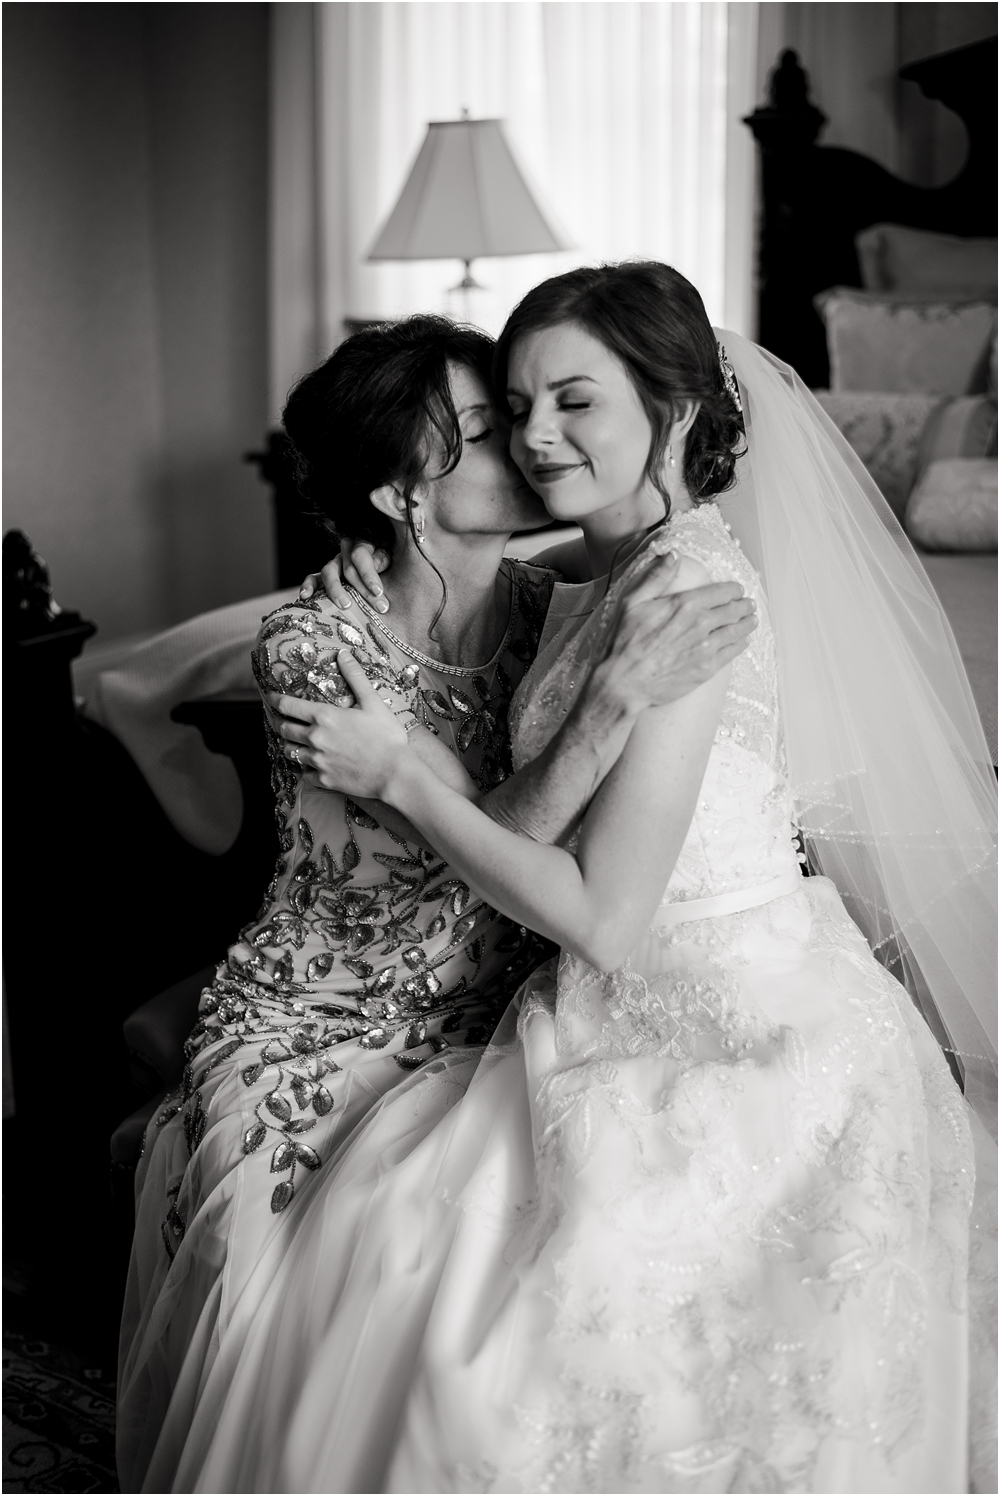 marianna-florida-wedding-photographer-kiersten-grant-109.jpg